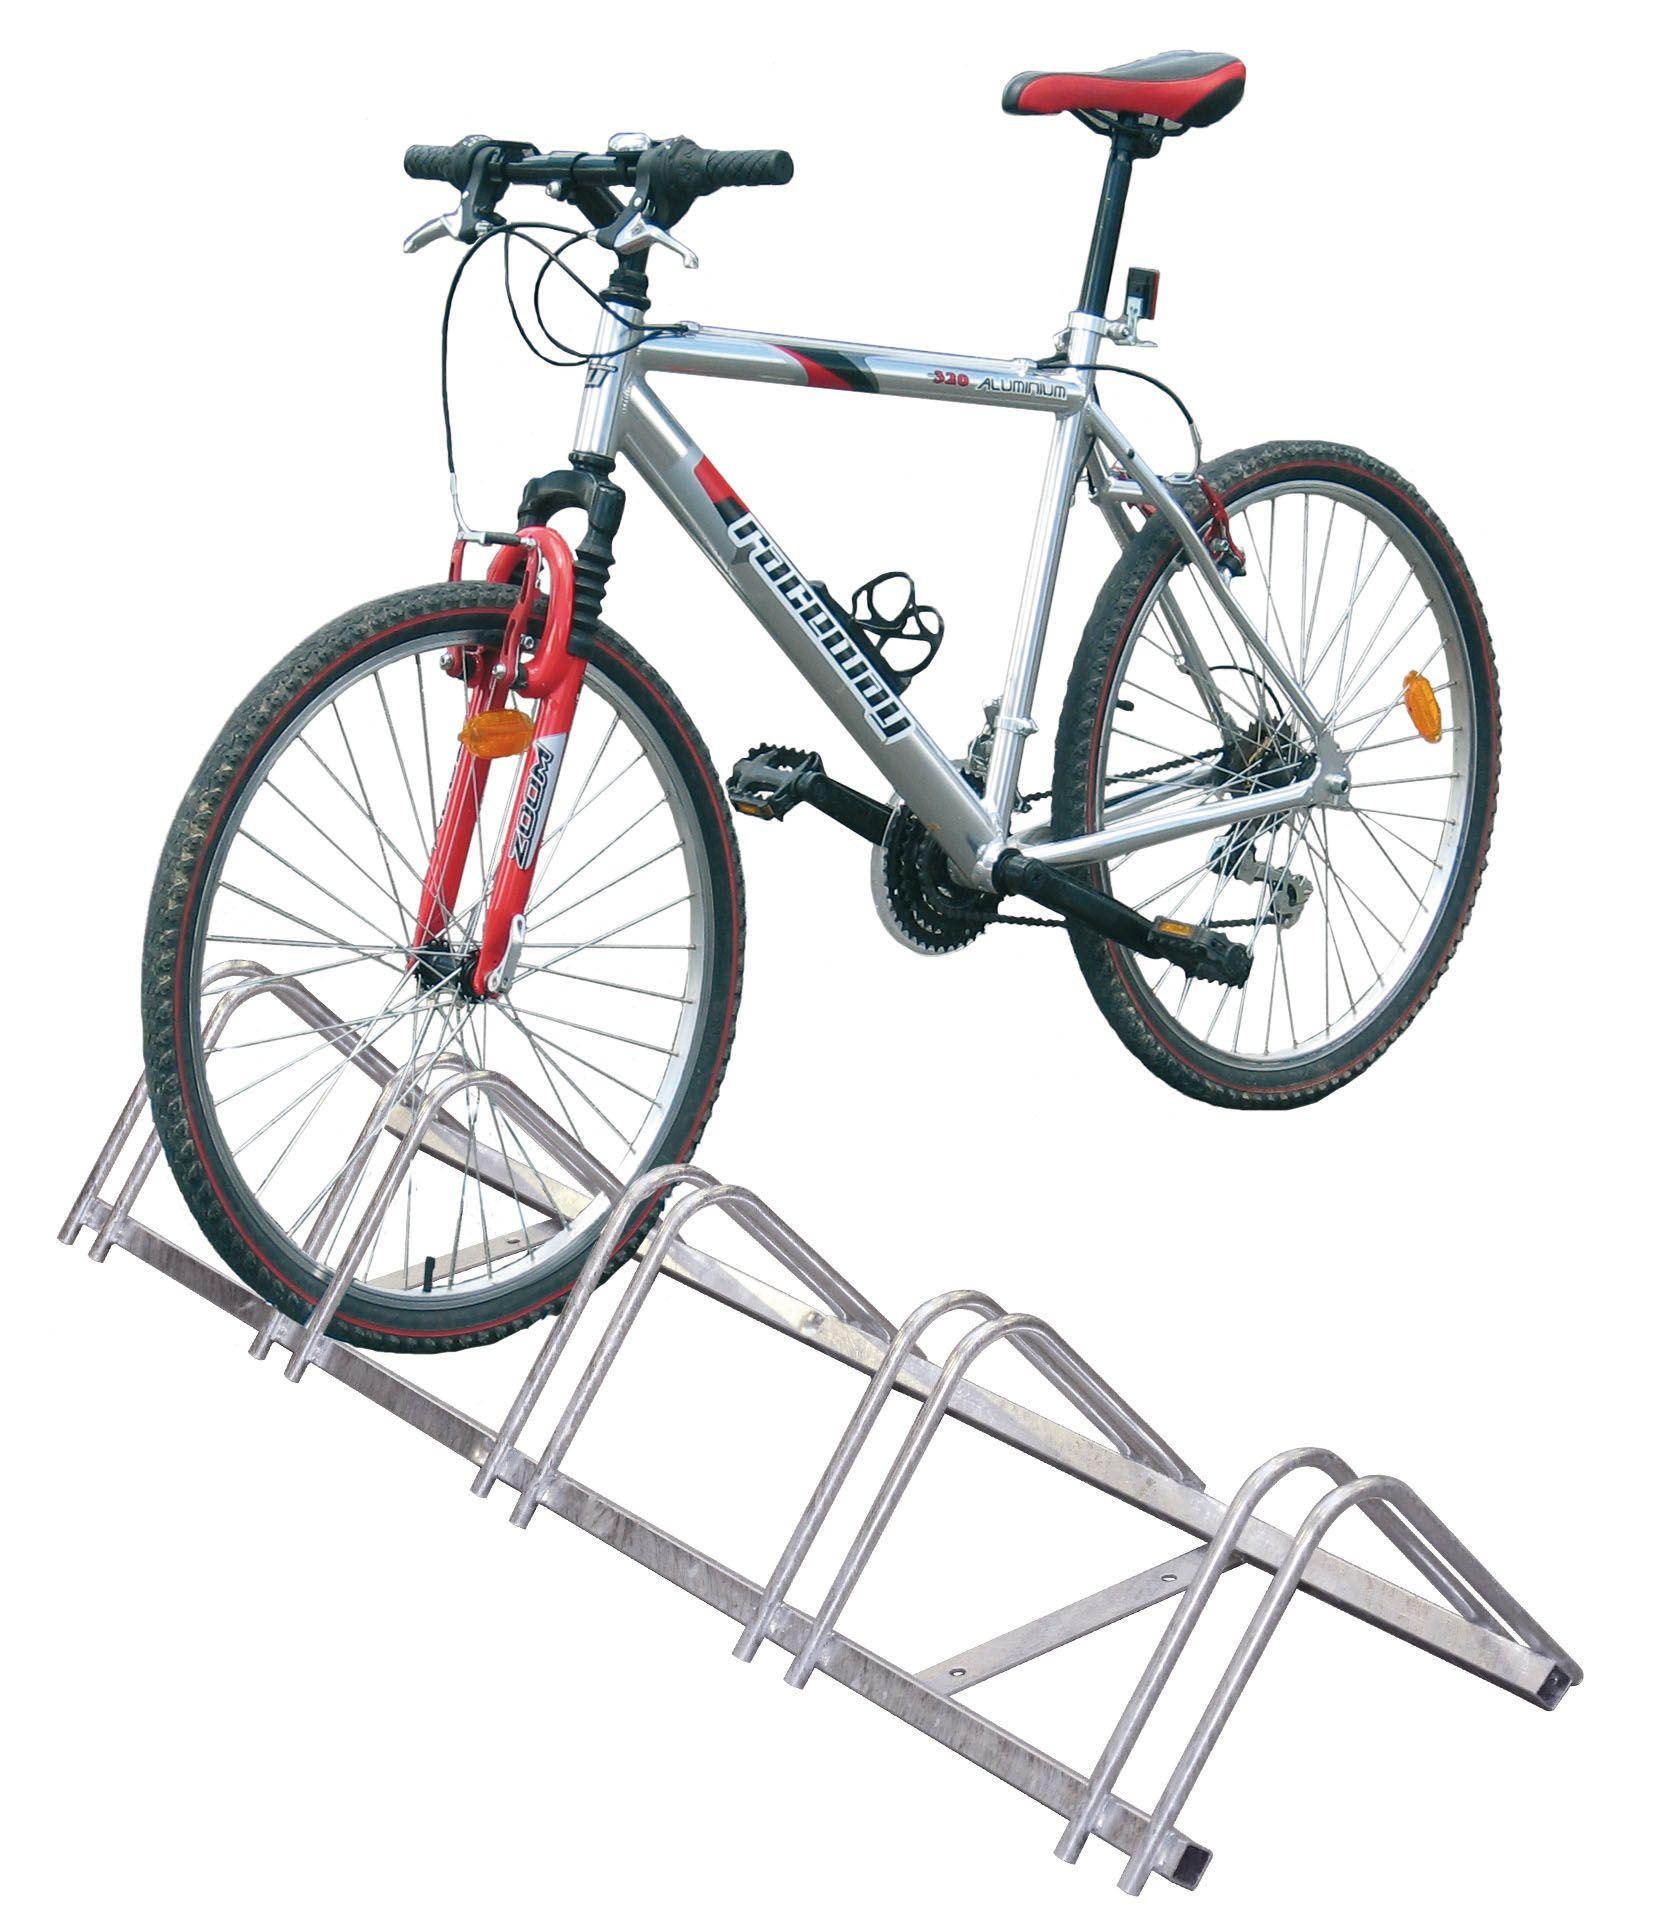 PROCITY Infinite Cycle Rack 204706 | Industrial | Pinterest | Cycle ...